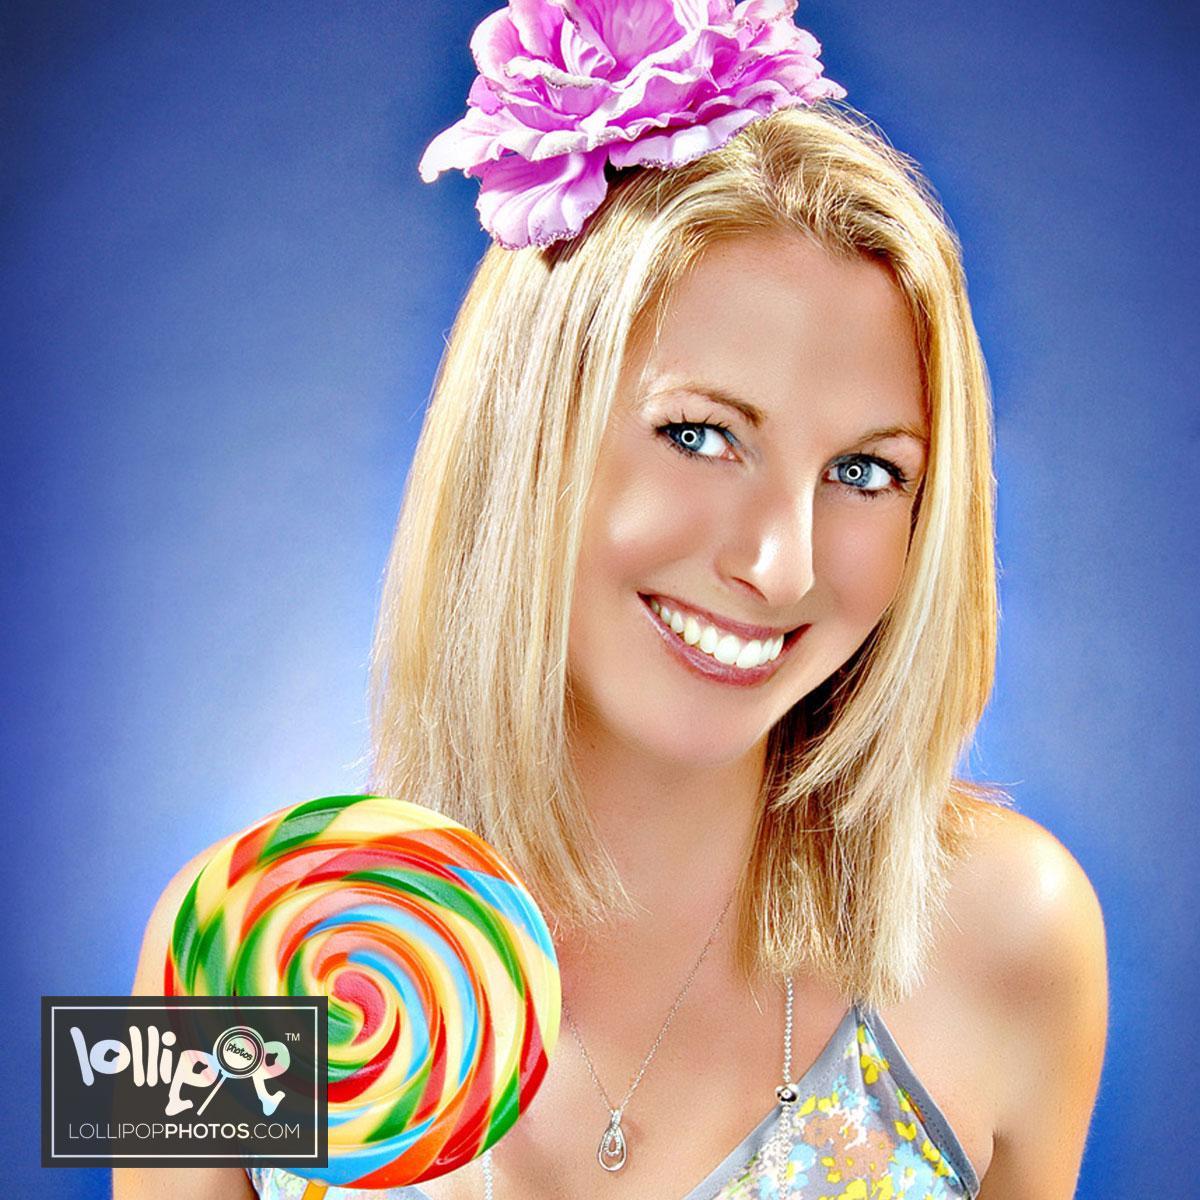 msdig-nora-canfield-lollipop-photos-261.jpg